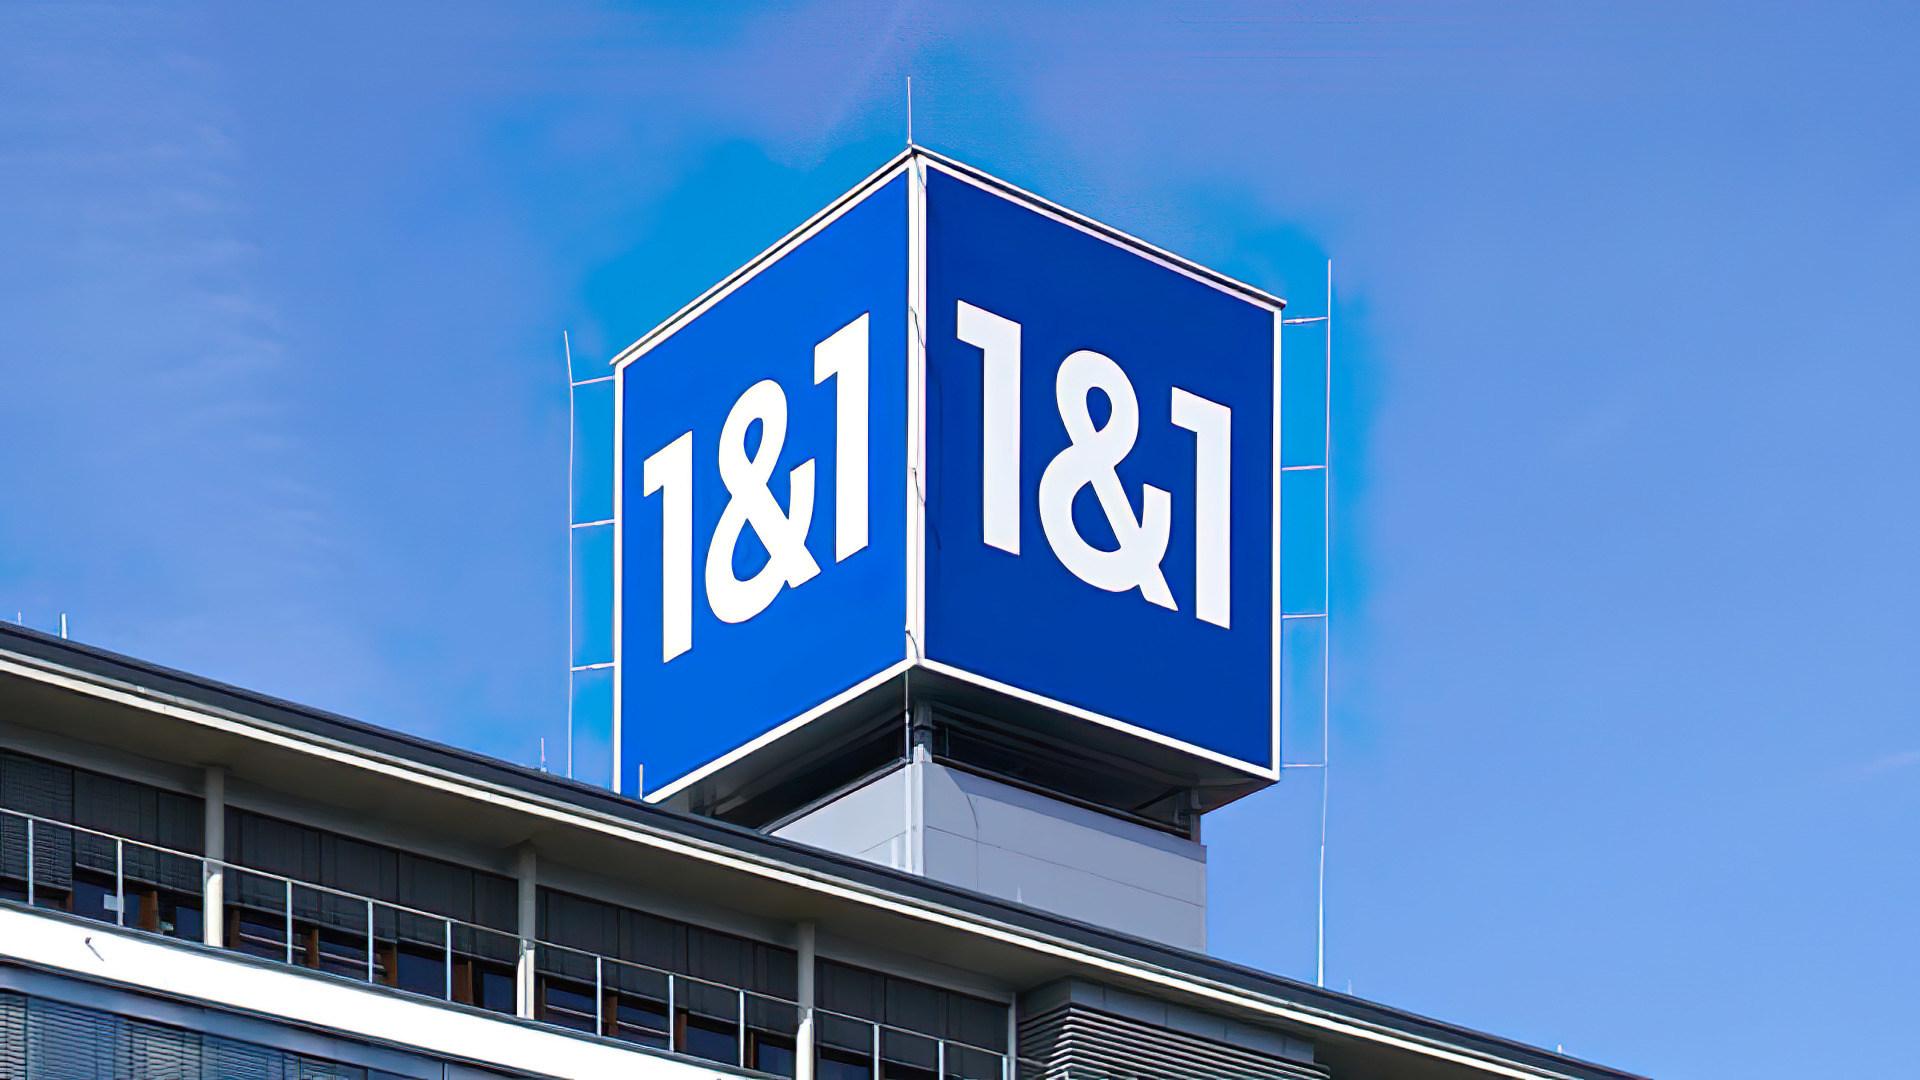 Logo, Mobilfunk, Dsl, 1&1, Austausch, Standort, United Internet, Service Card